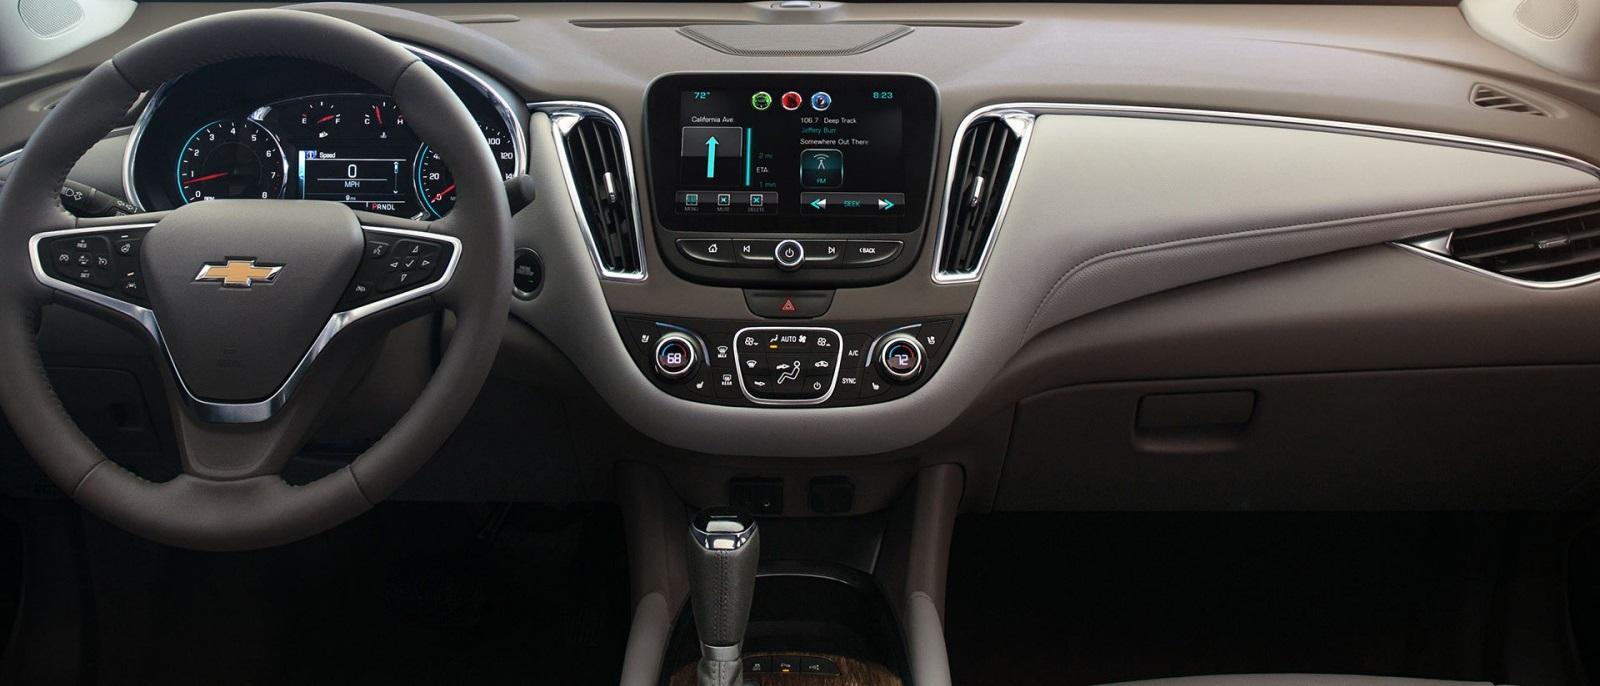 2016 Chevy Malibu Hybrid Interior front dashboard view